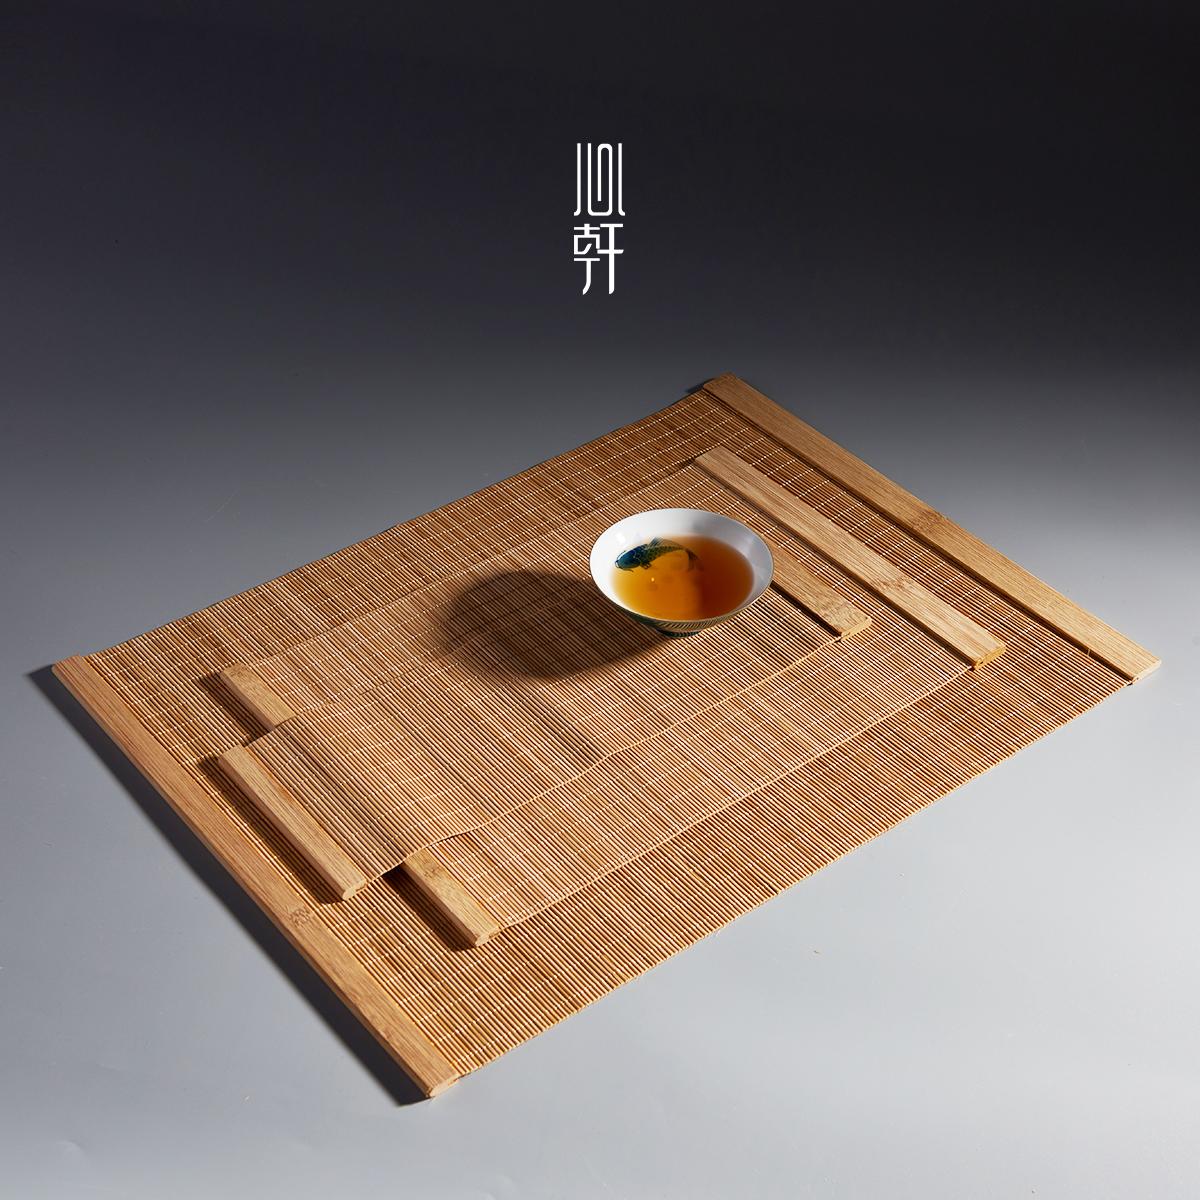 Xinxuan bộ trà trà mat coaster linen bảng cờ dệt handmade tre rèm tre mat tre mat trà mat trà rèm cách nhiệt mat